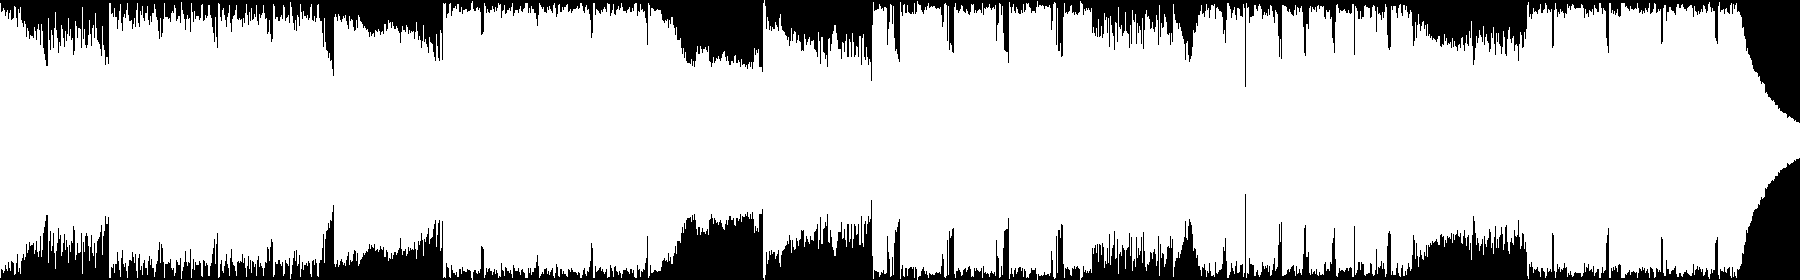 Oblivion 2 – Deep Dubstep audio waveform